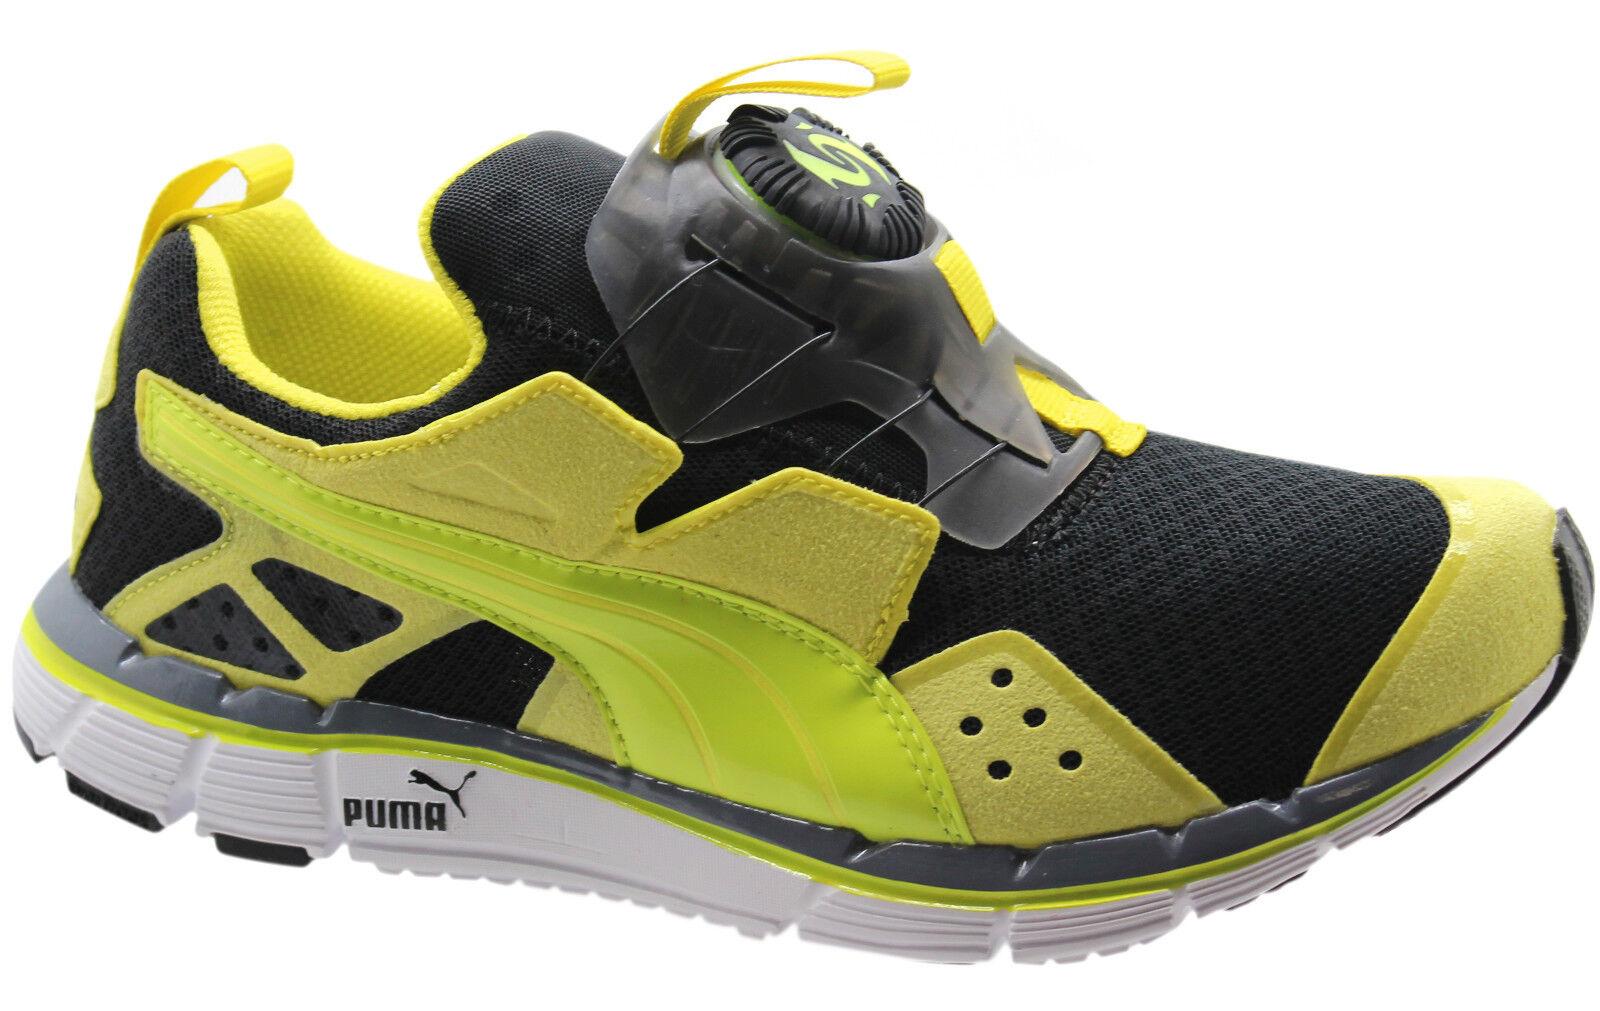 Puma Dischetti Ltwt 2.0 Leggero shoes Sportive men yellow black Slip On 186701